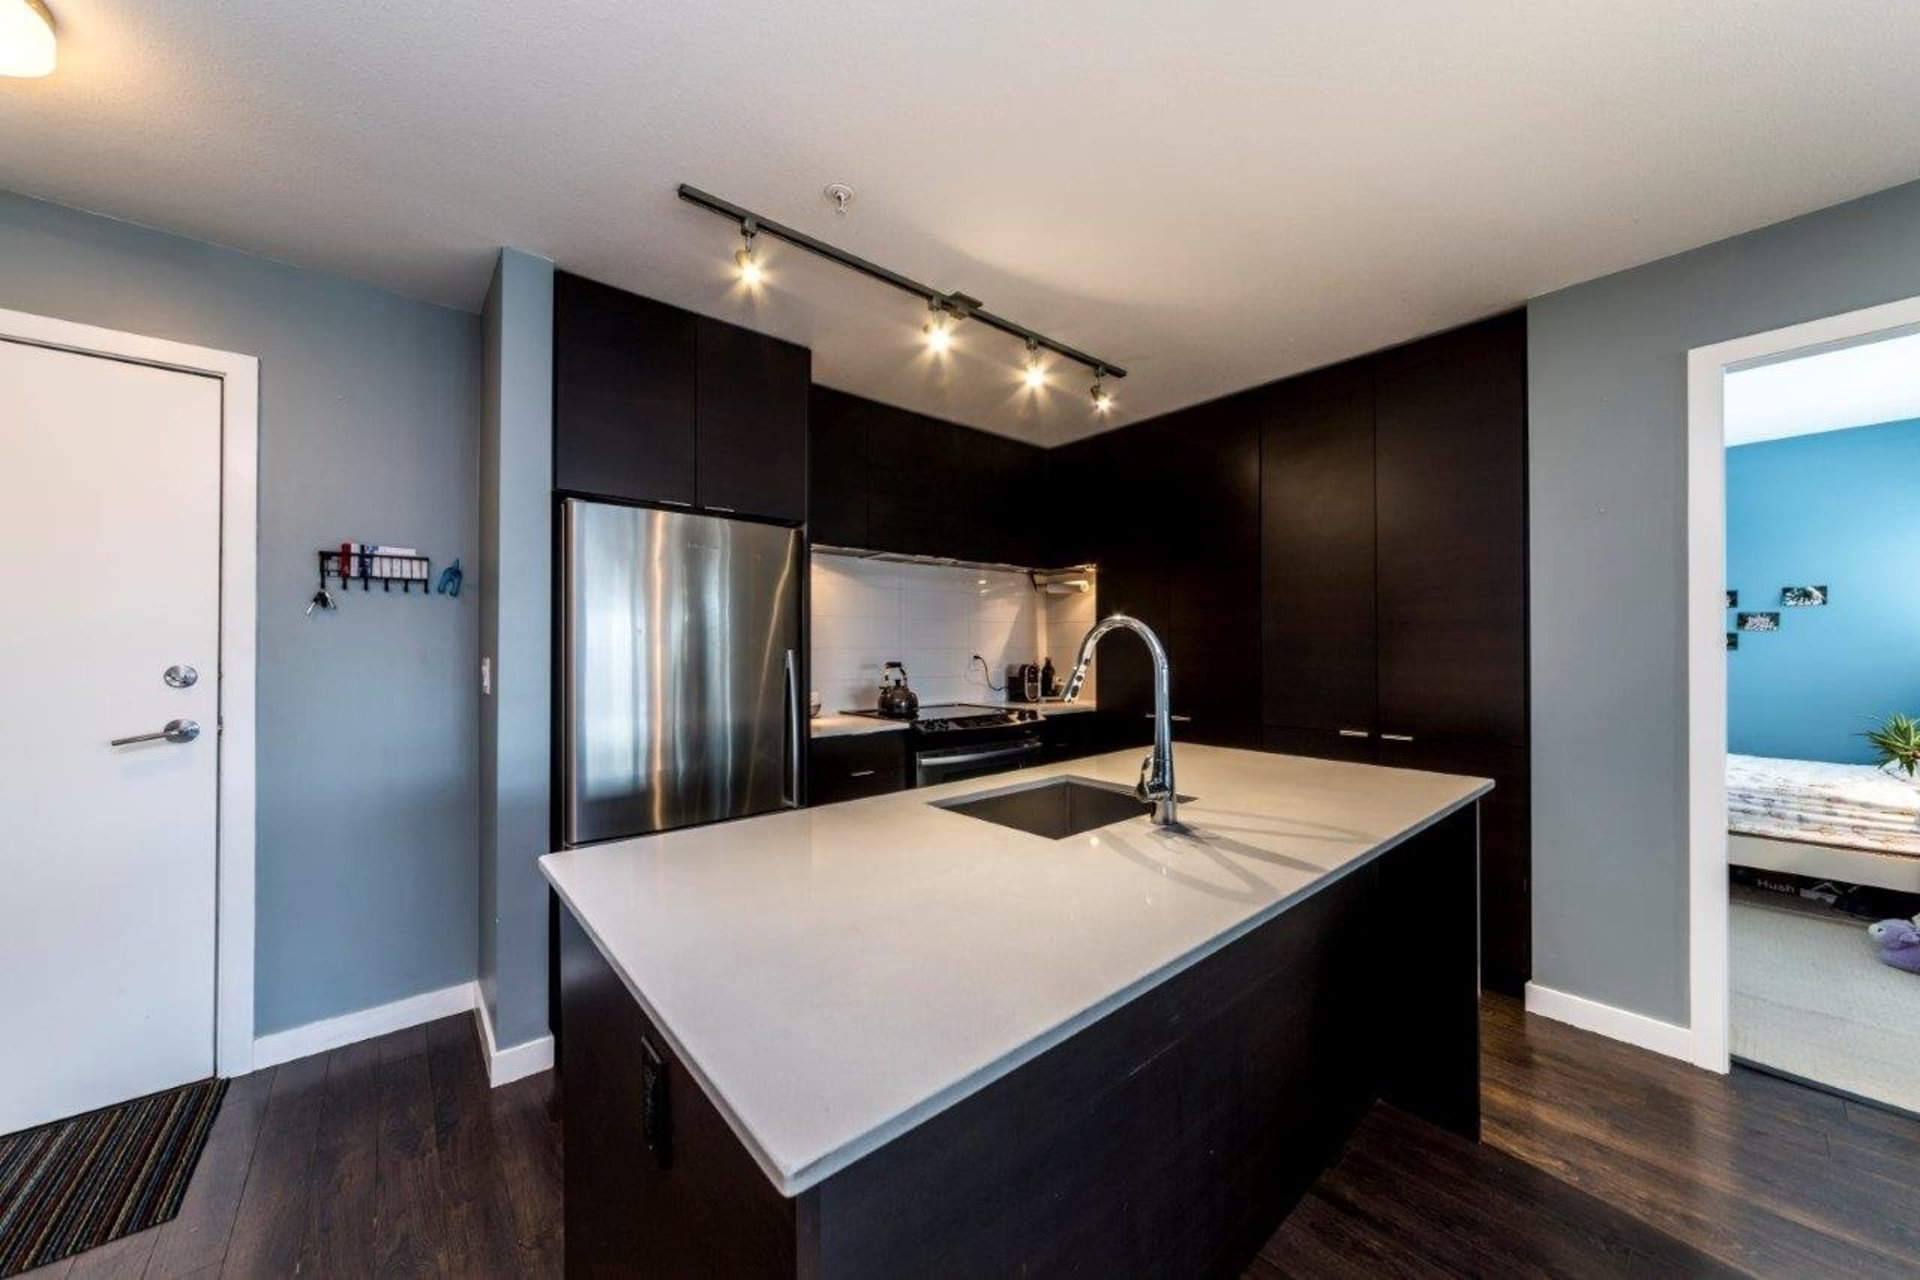 1673-lloyd-avenue-pemberton-nv-north-vancouver-03 at 307 - 1673 Lloyd Avenue, Pemberton NV, North Vancouver